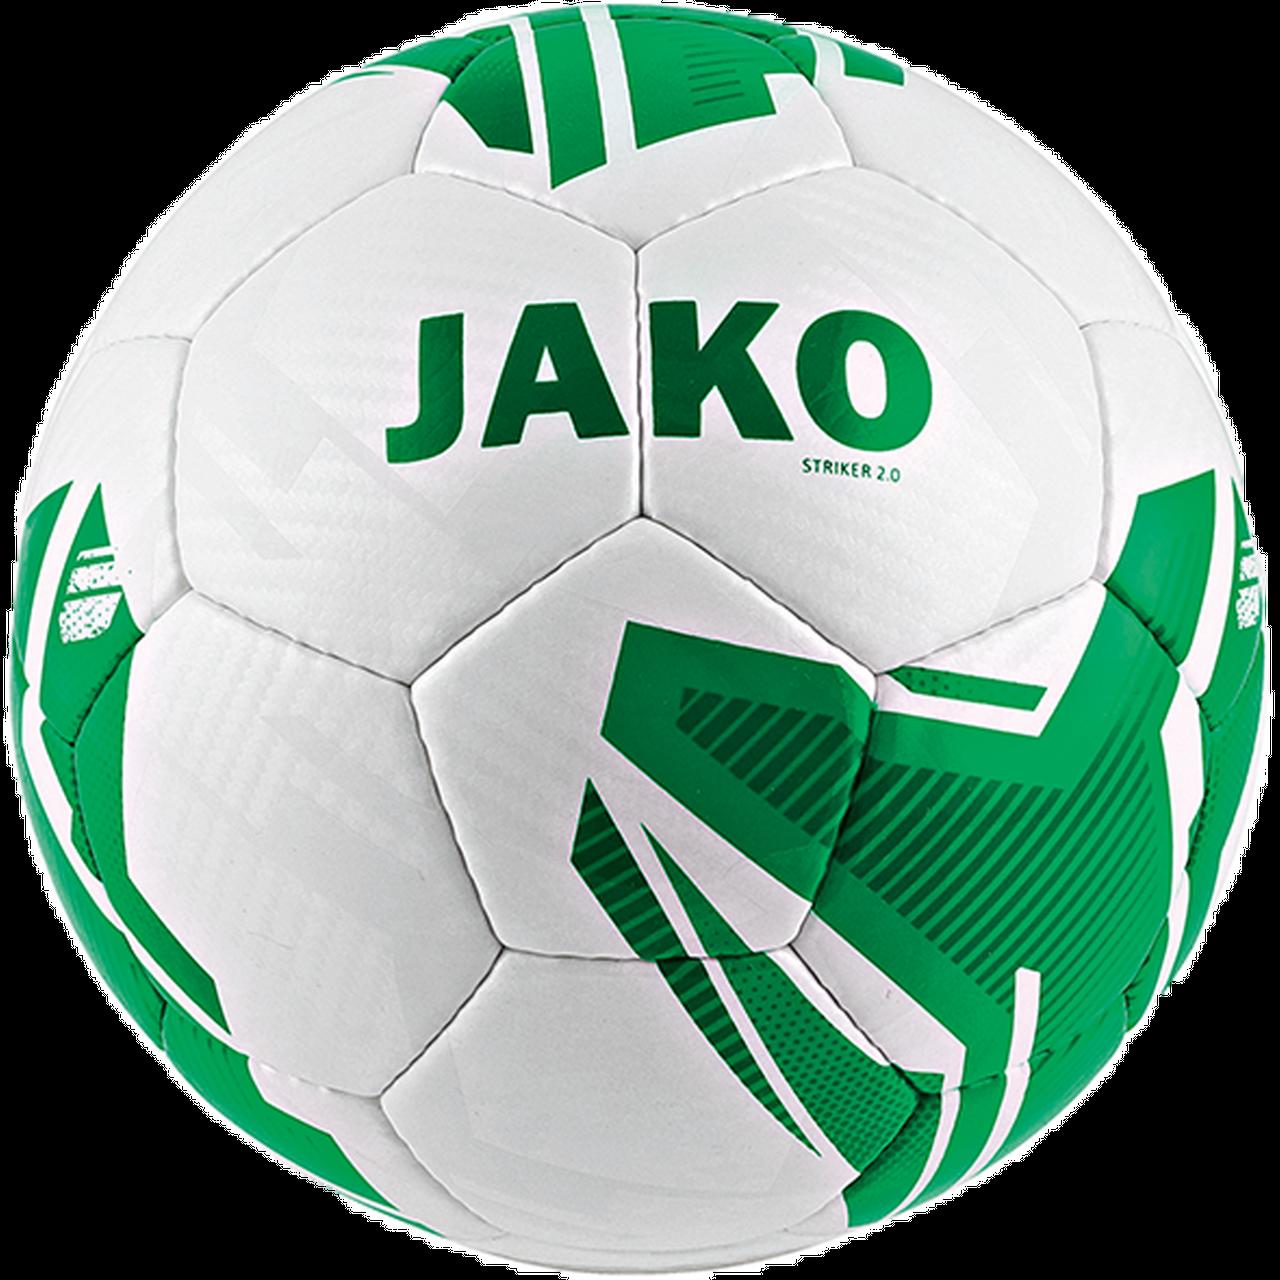 JAKO Jugendball Striker 2.0 HS